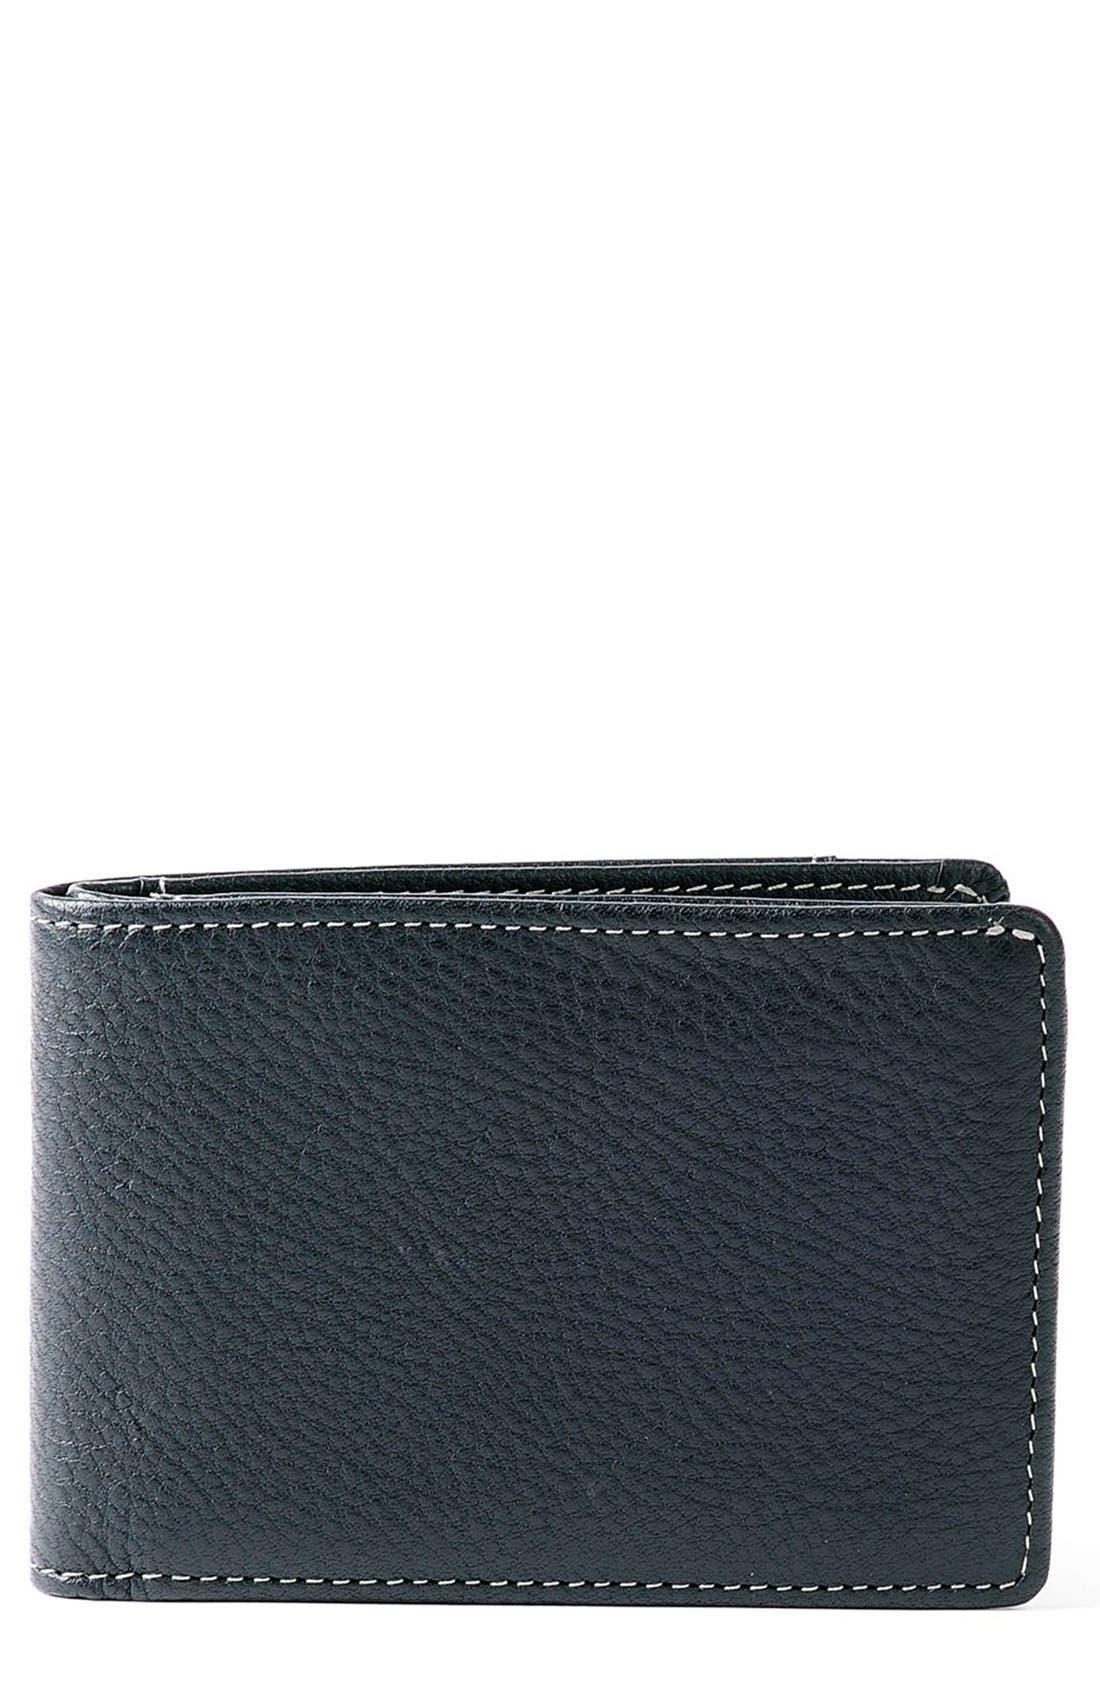 BOCONI Tyler RFID Slimster Wallet